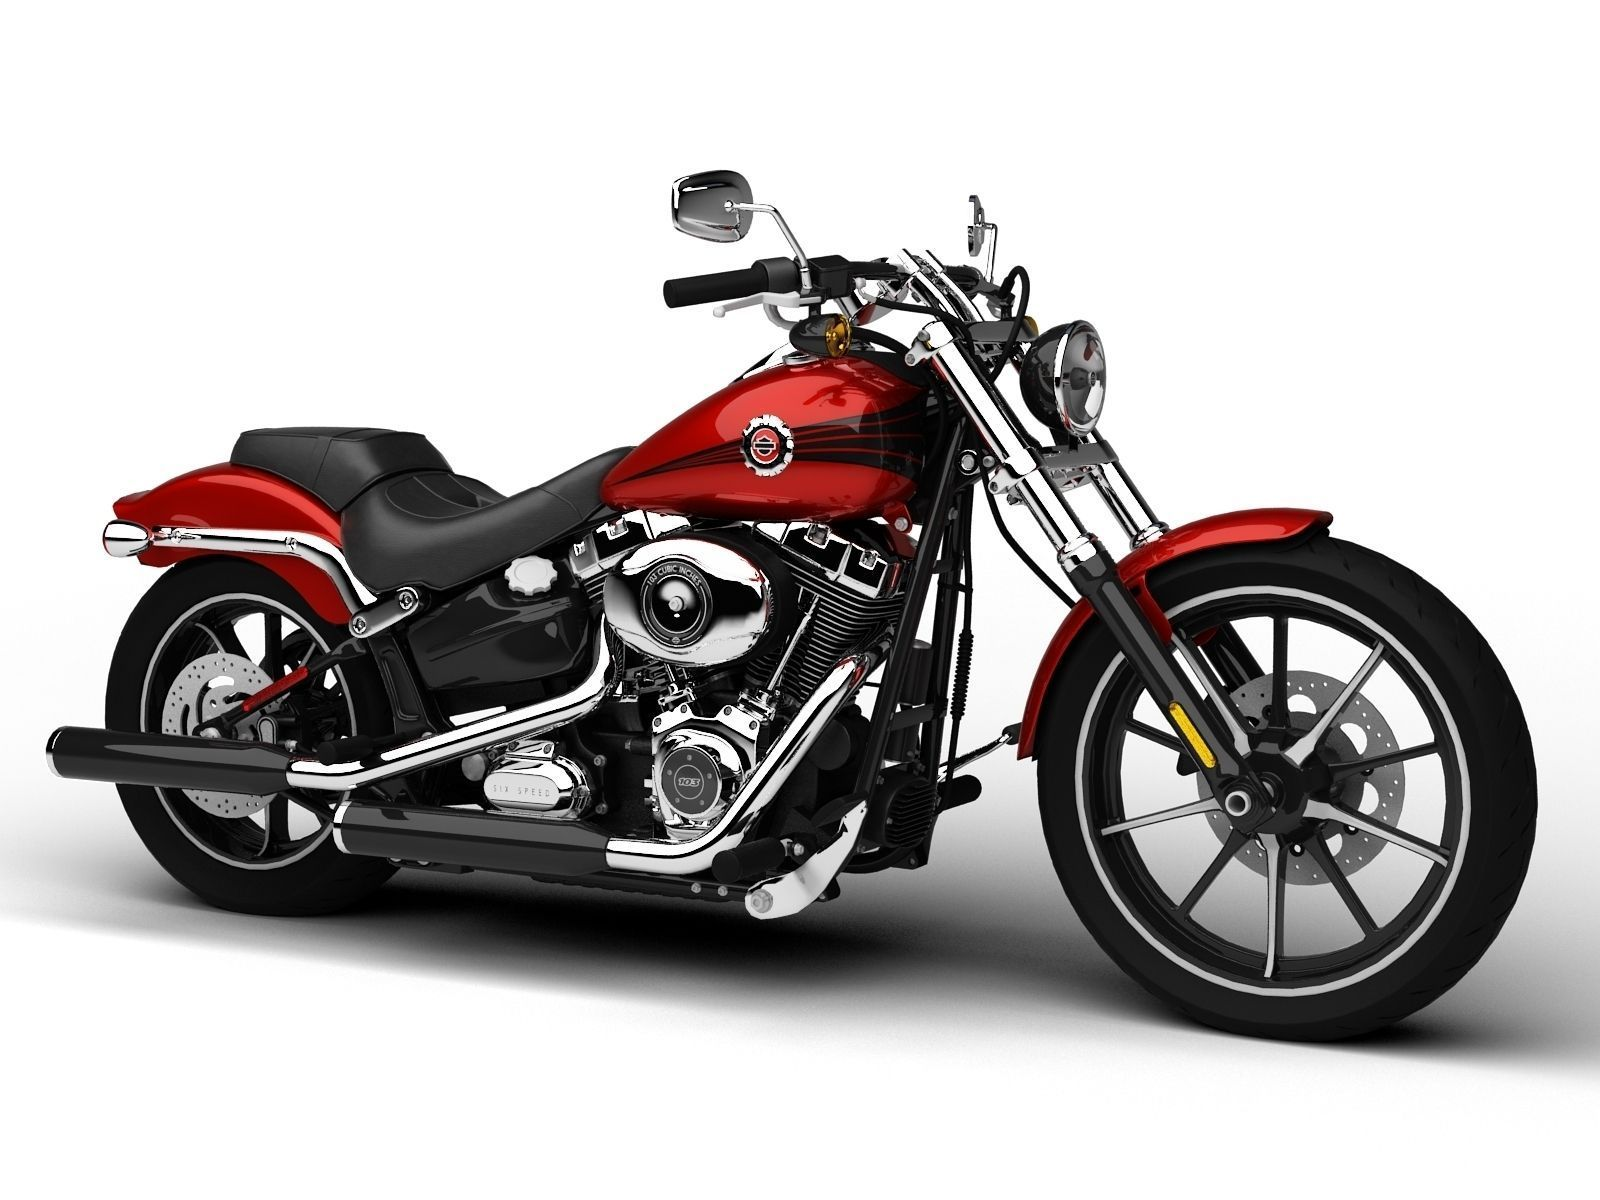 Harley Davidson Softail Breakout Fxsb Parts